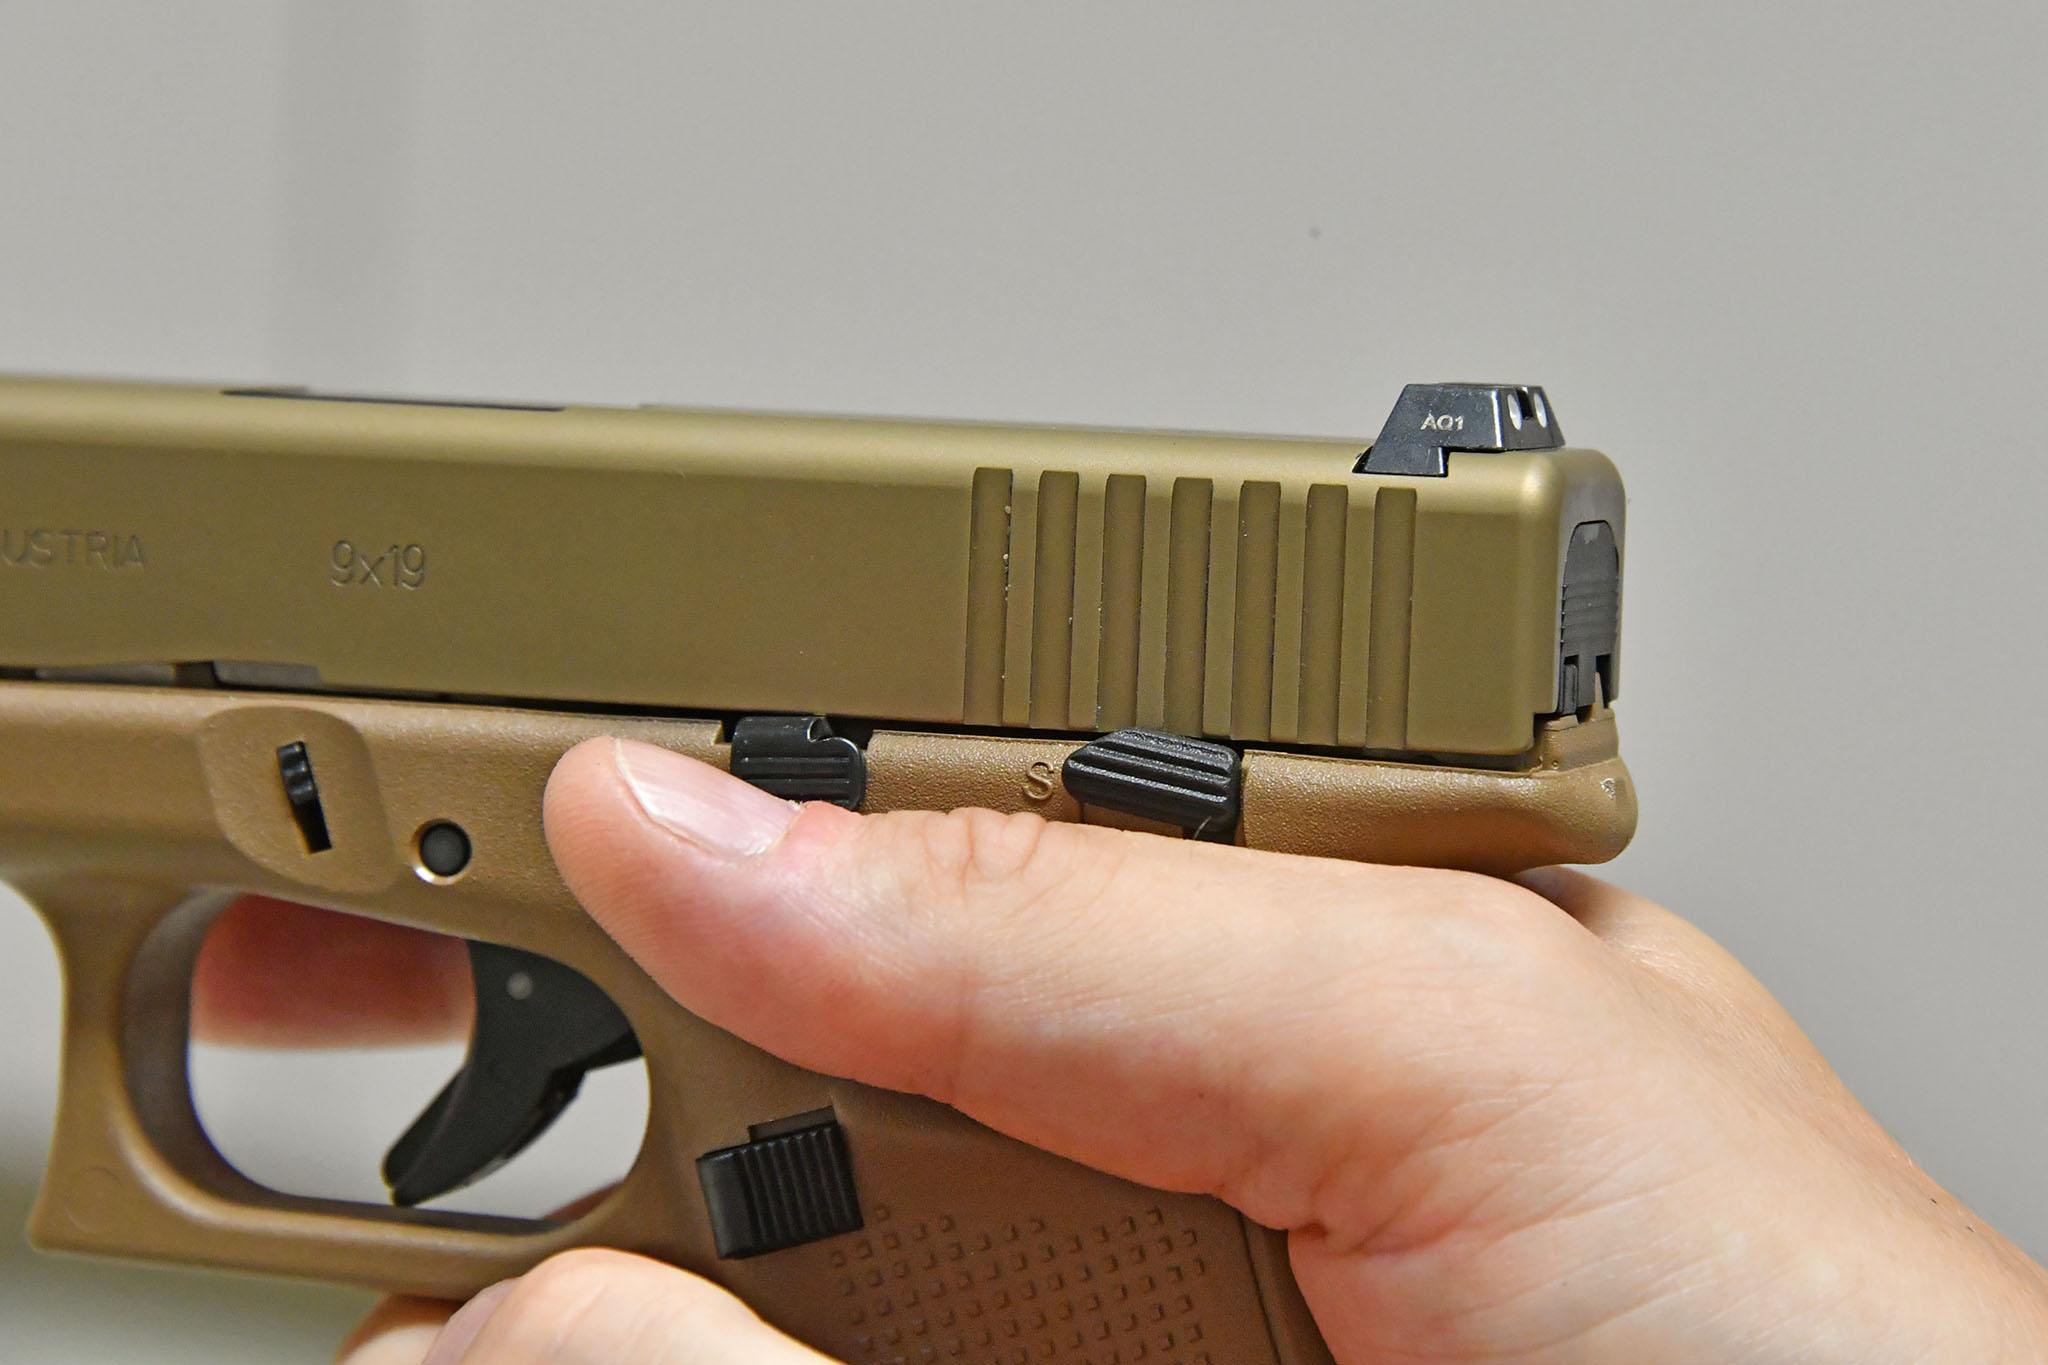 glock 19 mhs modular handgun system all4shooters com rh all4shooters com Glock Manual Safety Review Glock 19 Maintenance Manual